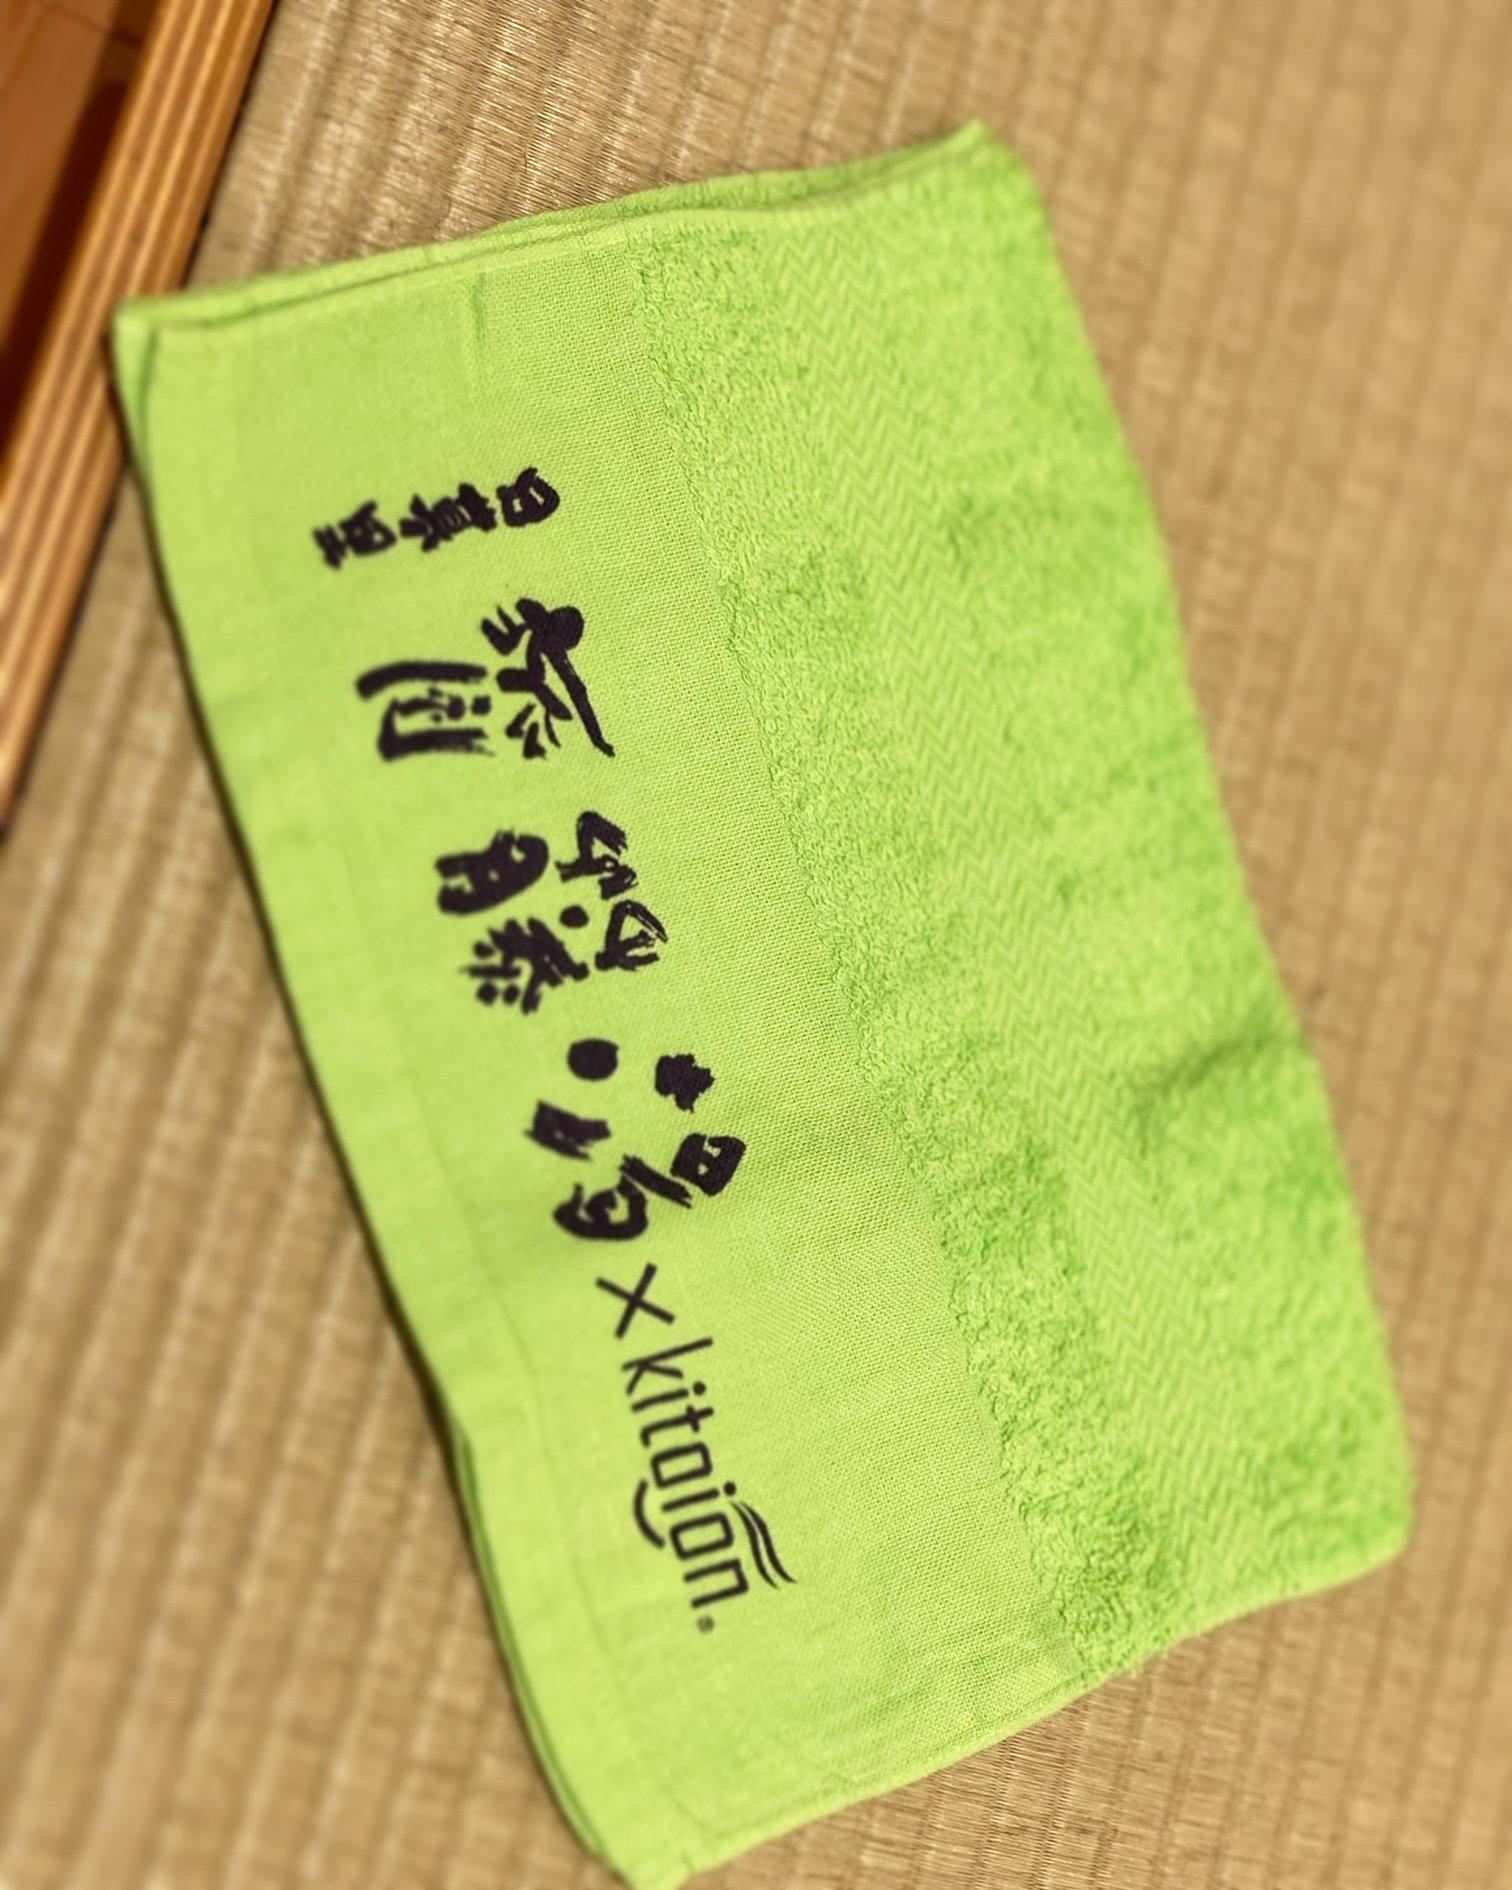 http://www.saito-yu.com/information/image1%20%285%29.jpeg